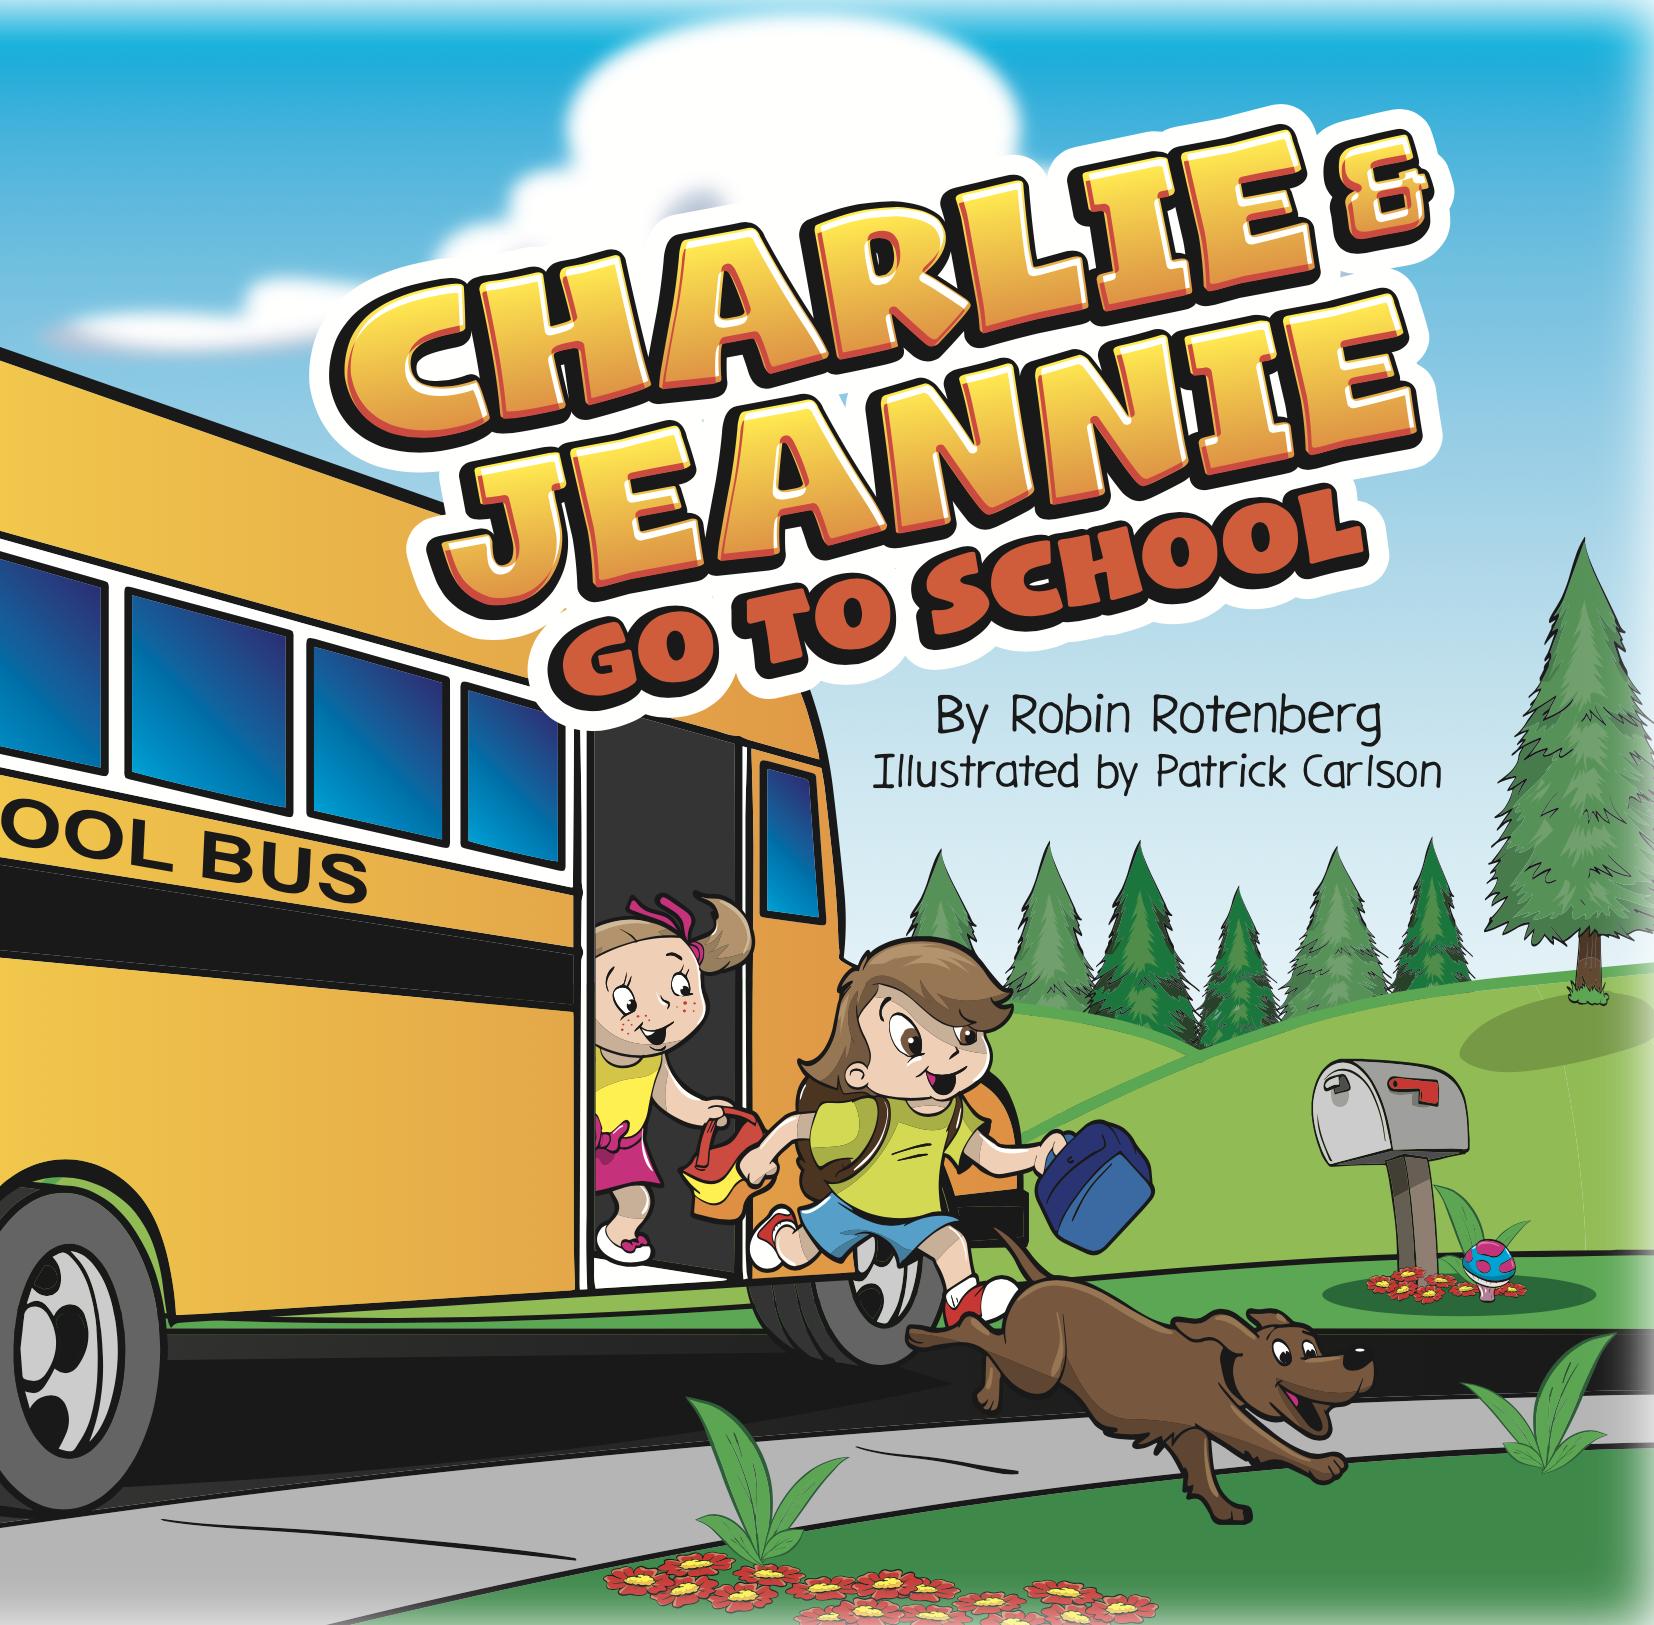 CharlieAndJeannineGoToSchool copy